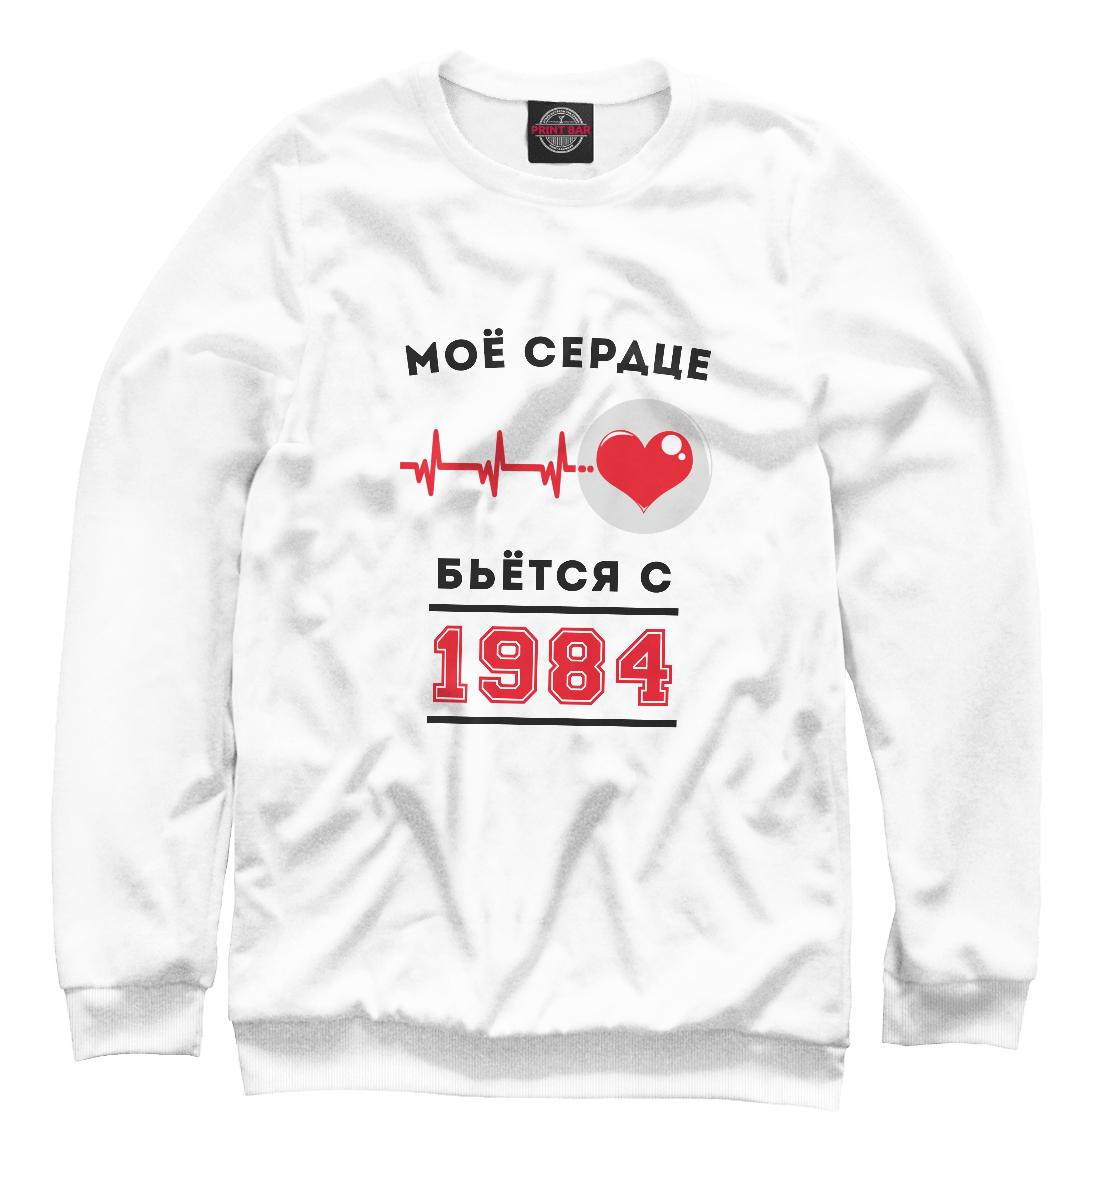 Купить Моё сердце бьётся с 1984, Printbar, Свитшоты, DVC-837964-swi-2